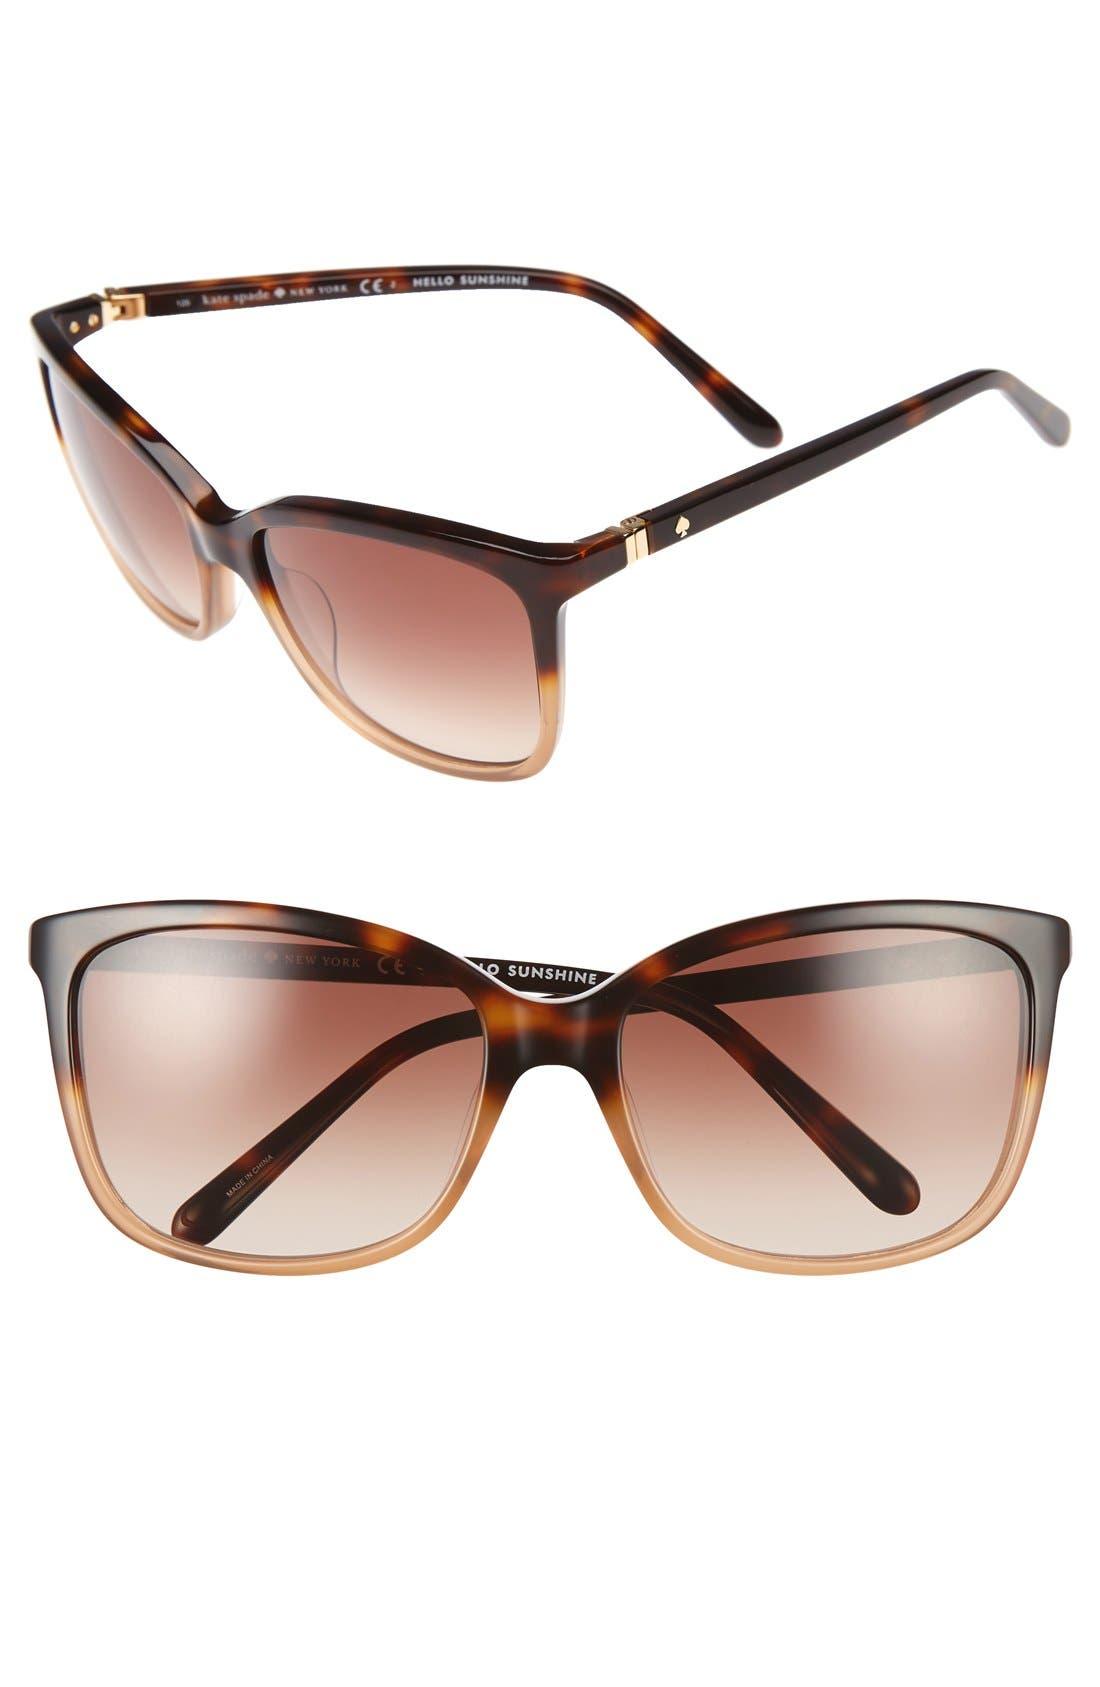 kasie 55mm cat eye sunglasses,                             Main thumbnail 1, color,                             Havana/ Nude